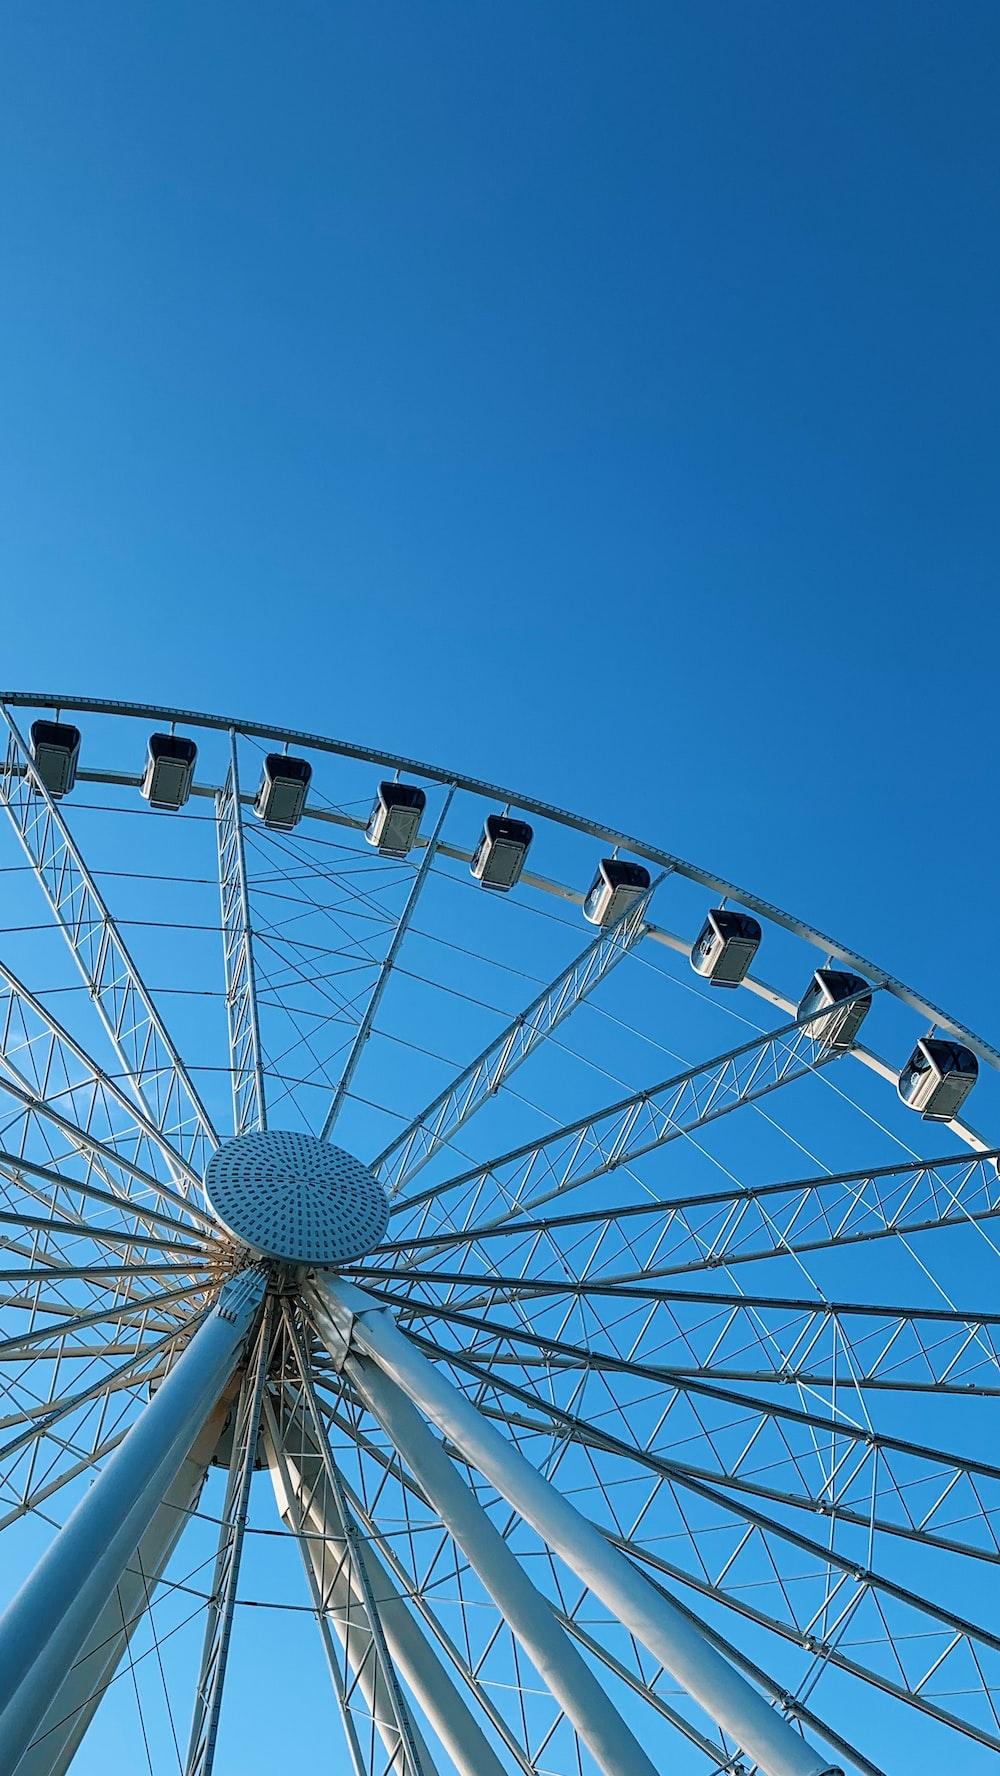 white Ferris wheel under blue sky